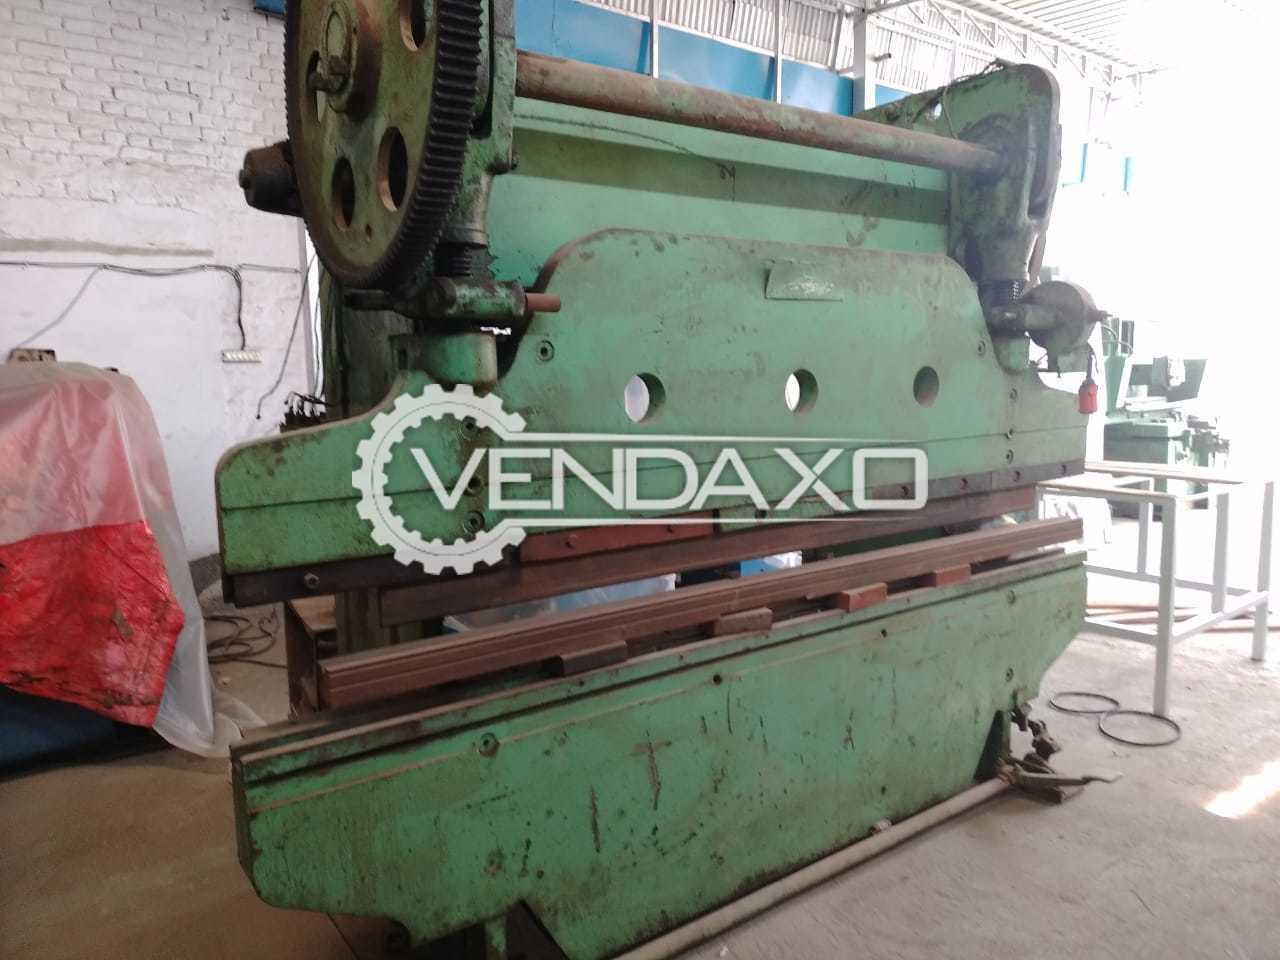 Indian Make Mechanical Press Brake Machine - 3000mm x 8mm